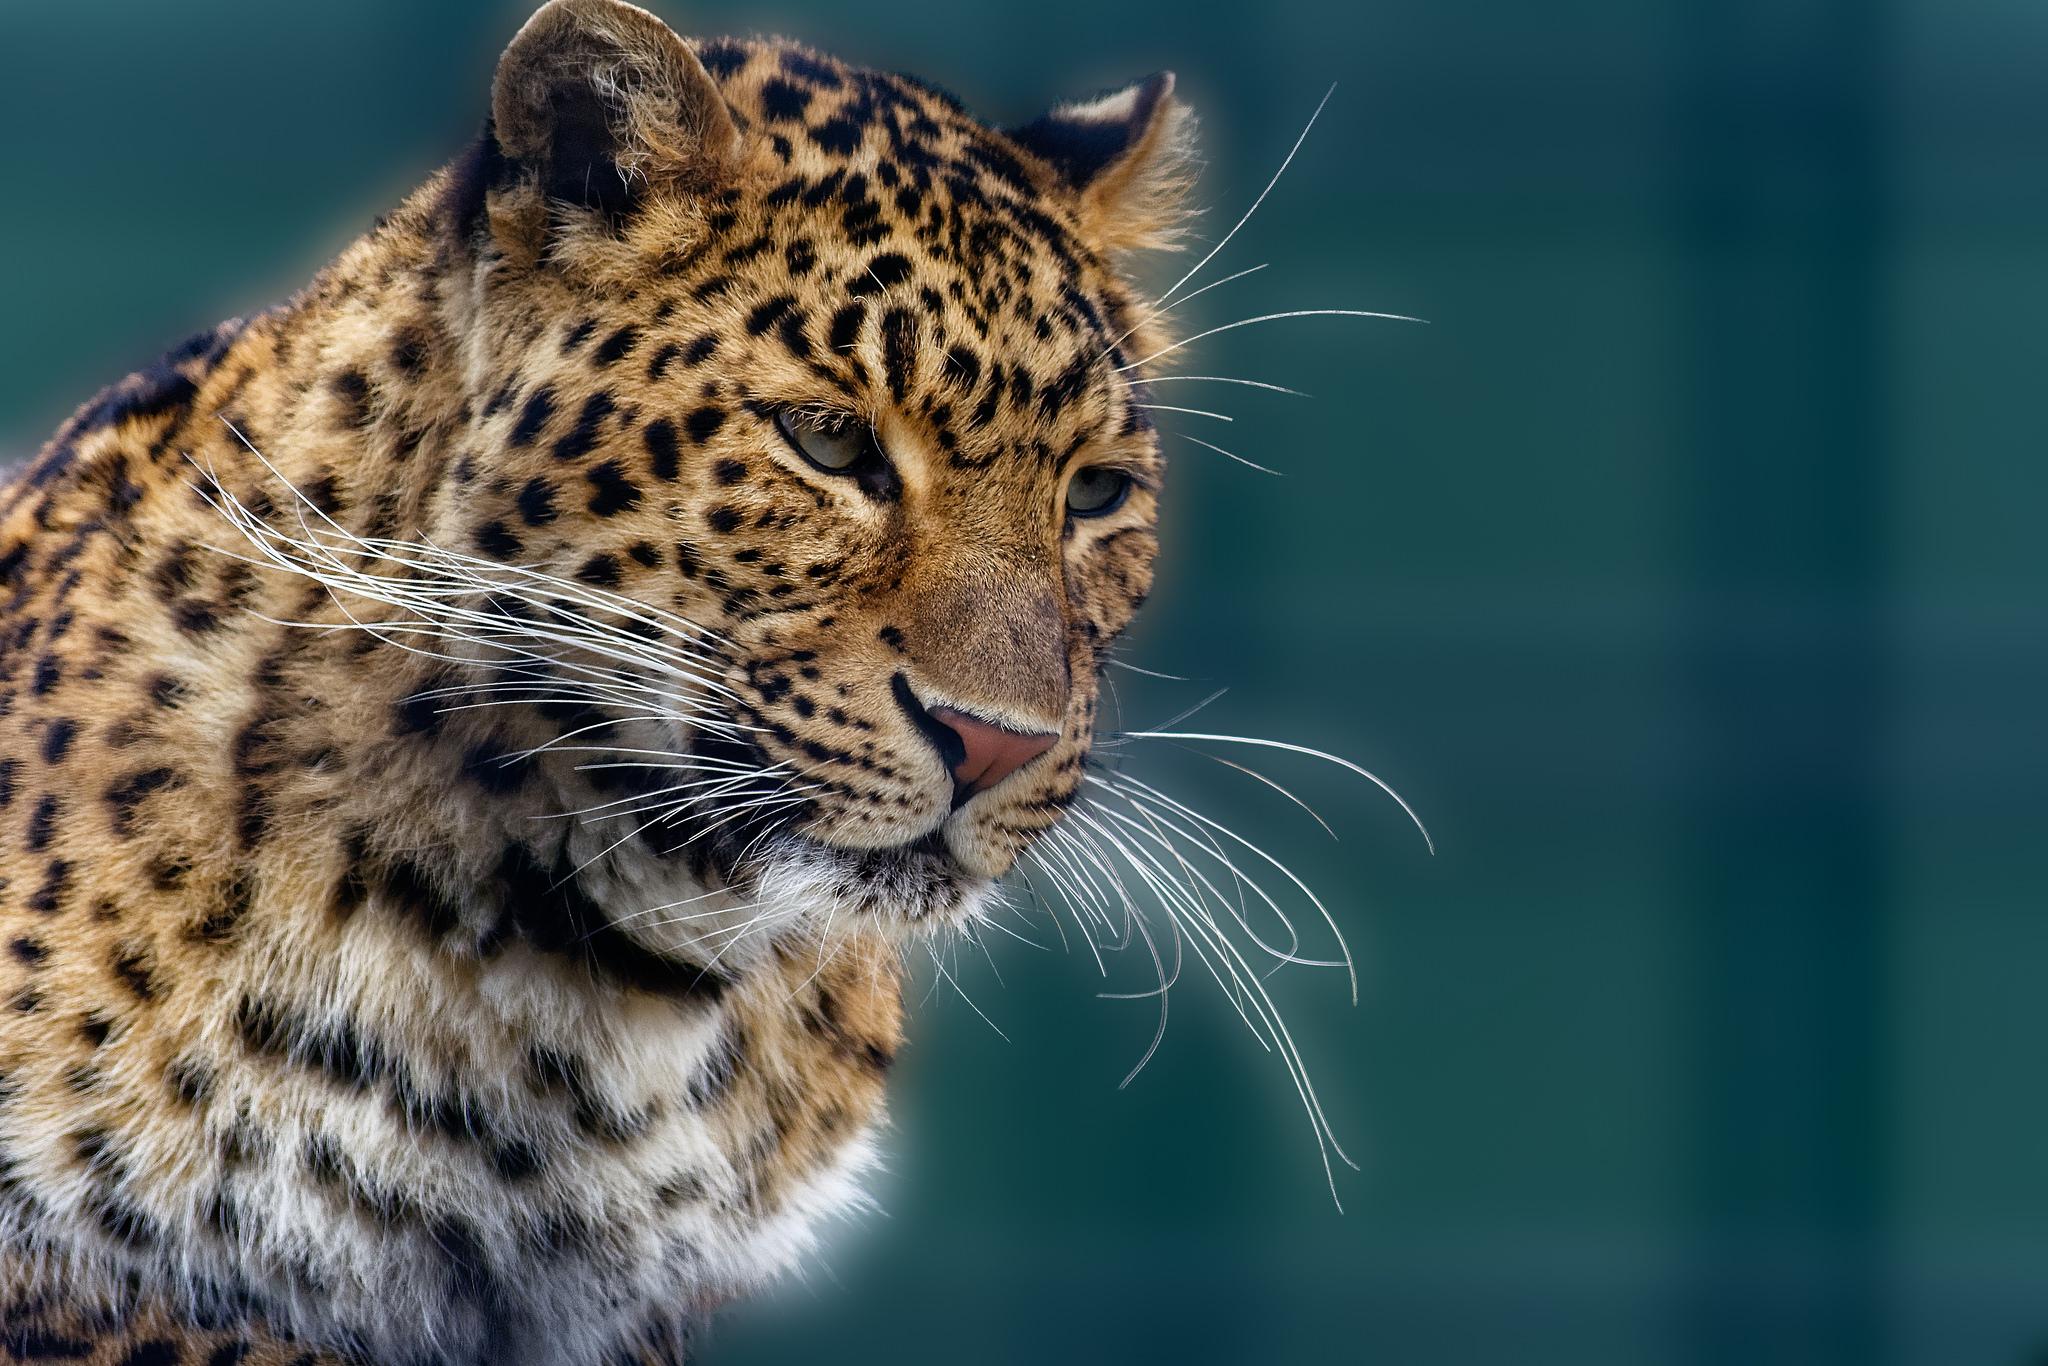 обои леопард, хищник, взгляд, животное картинки фото